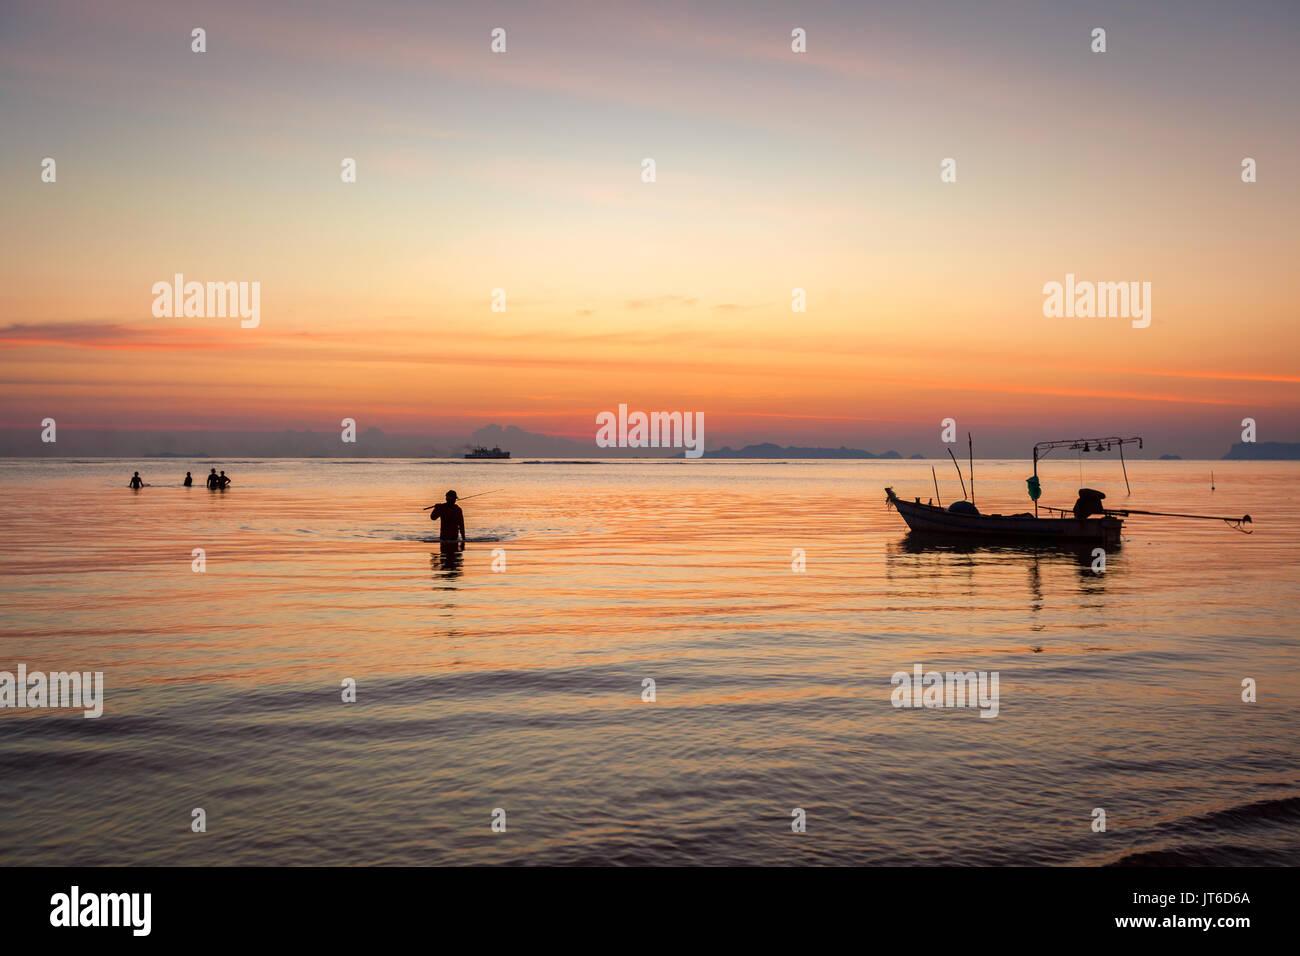 Thai fishermen silhouettes during a colorful tropical sunset, Nathon beach, Laem Yai, Koh Samui, Thailand - Stock Image